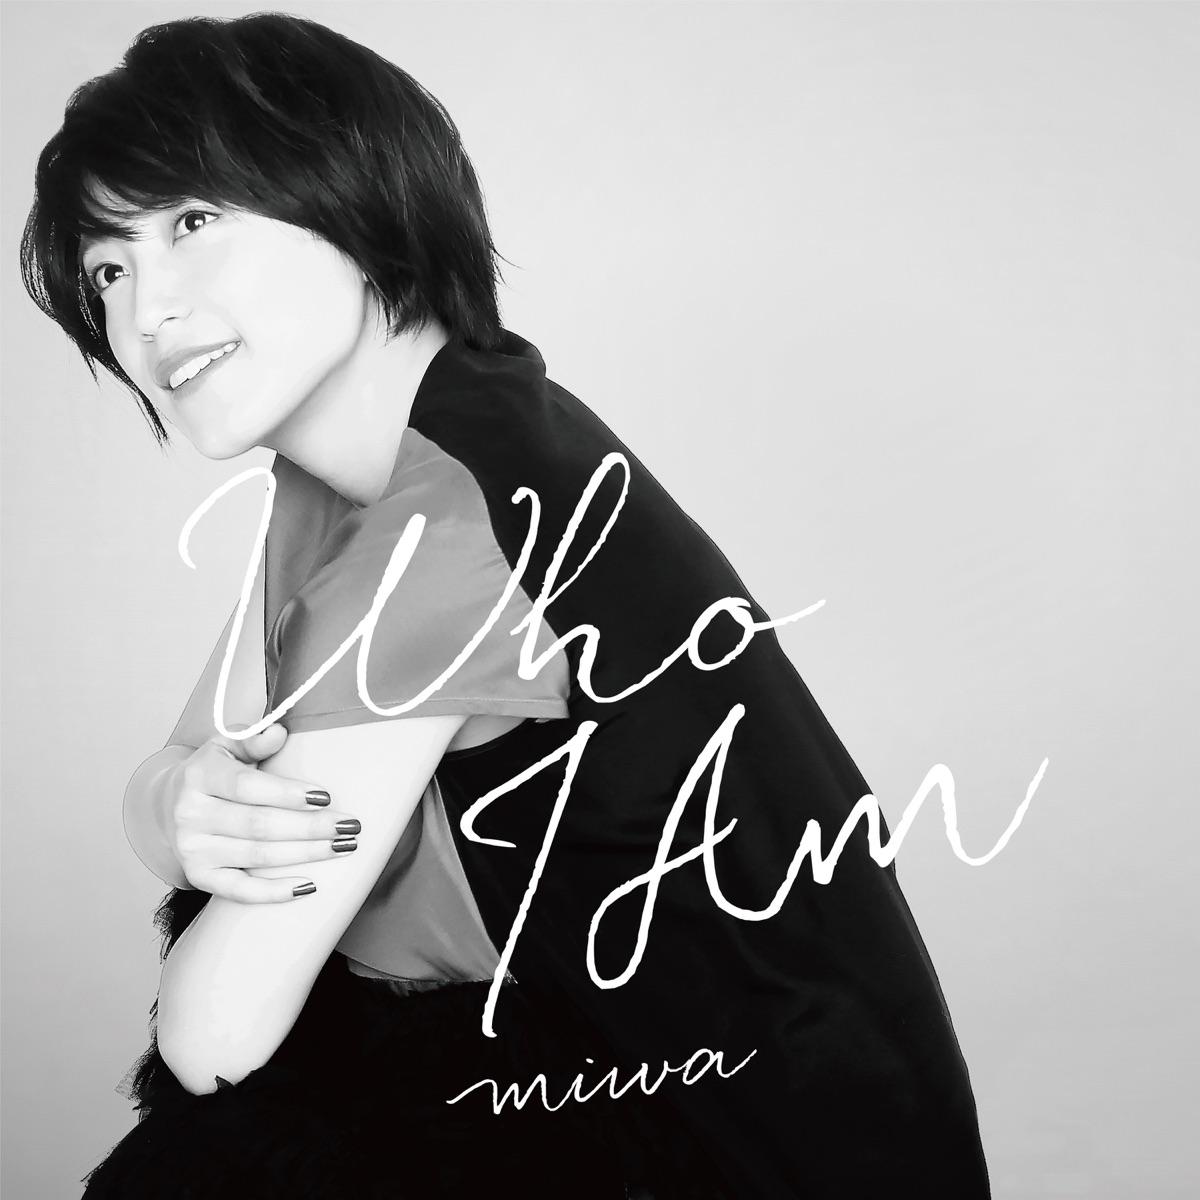 『miwa - Who I Am』収録の『Who I Am』ジャケット